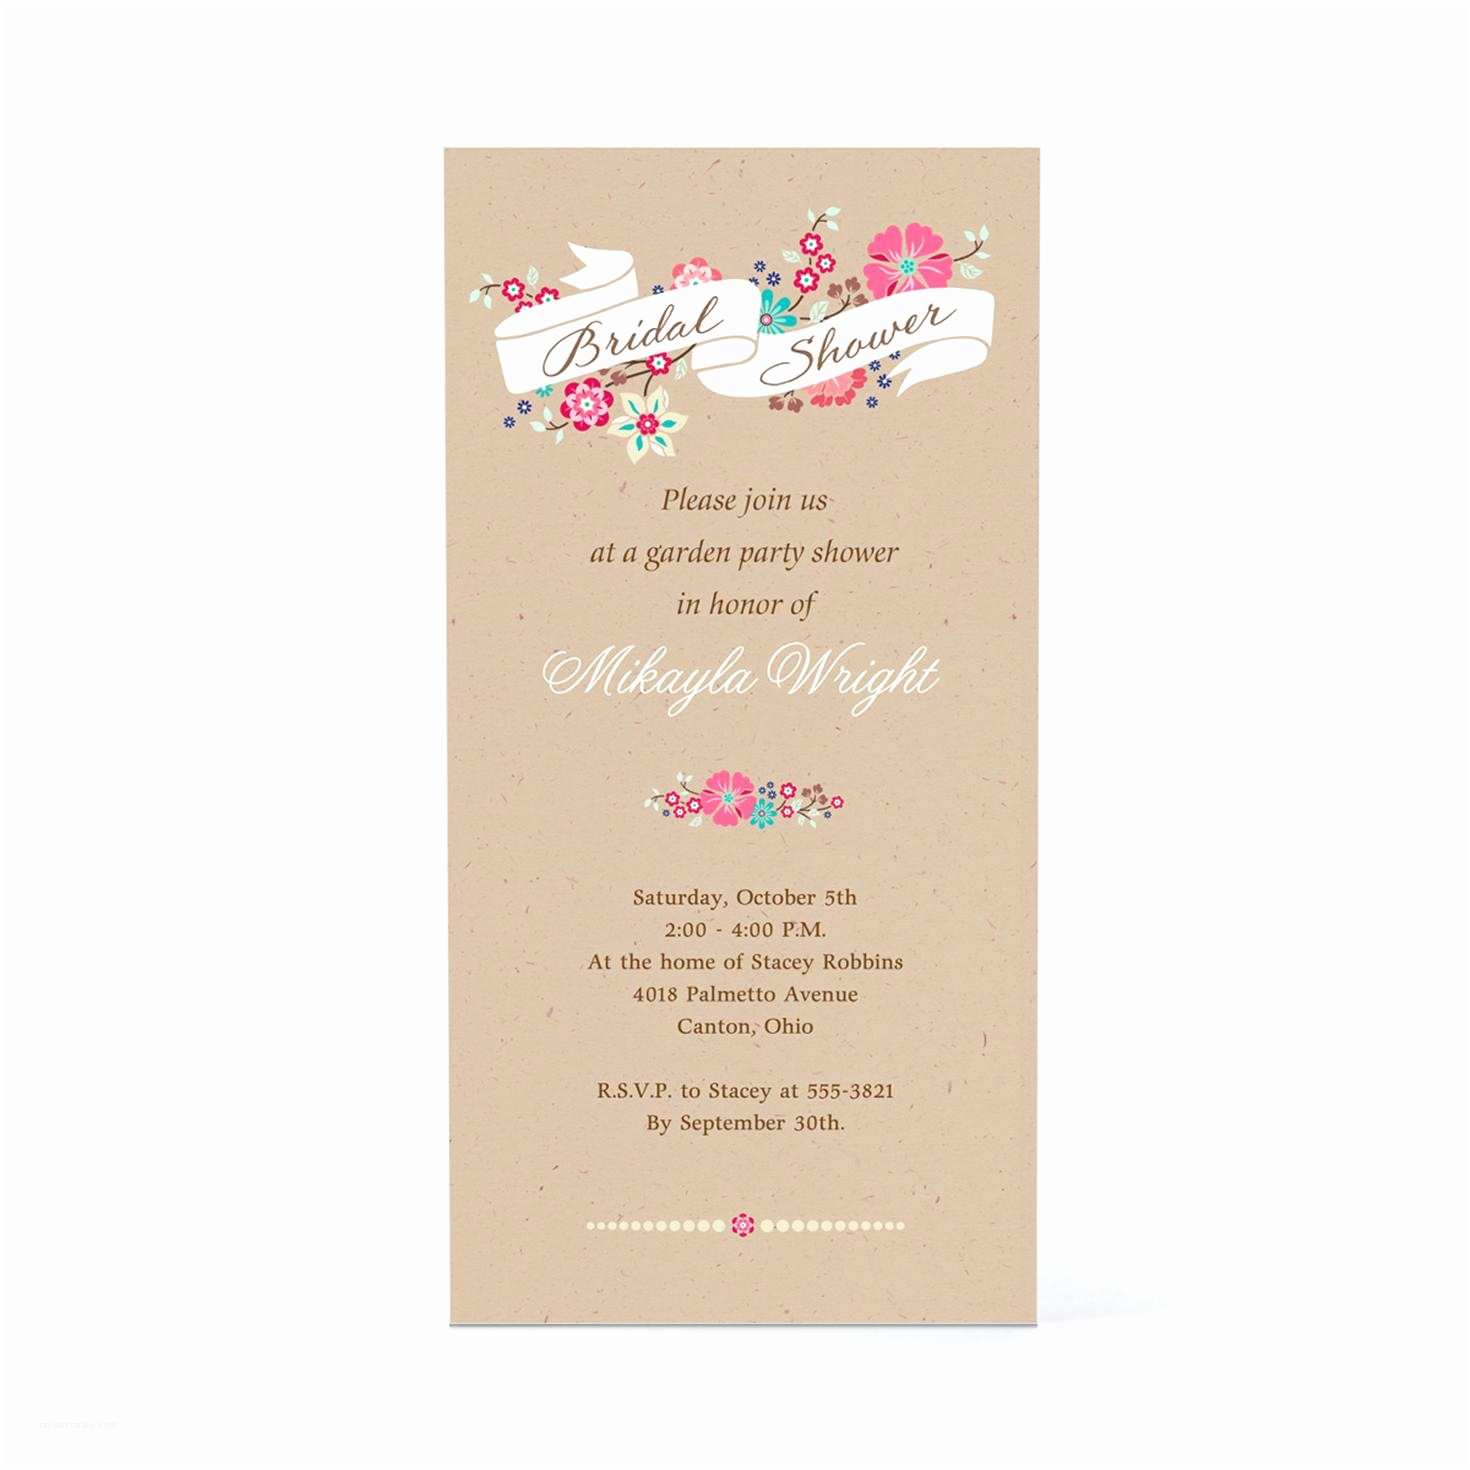 Hallmark Wedding Invitations Hallmark Wedding Shower Invitations Various Invitation